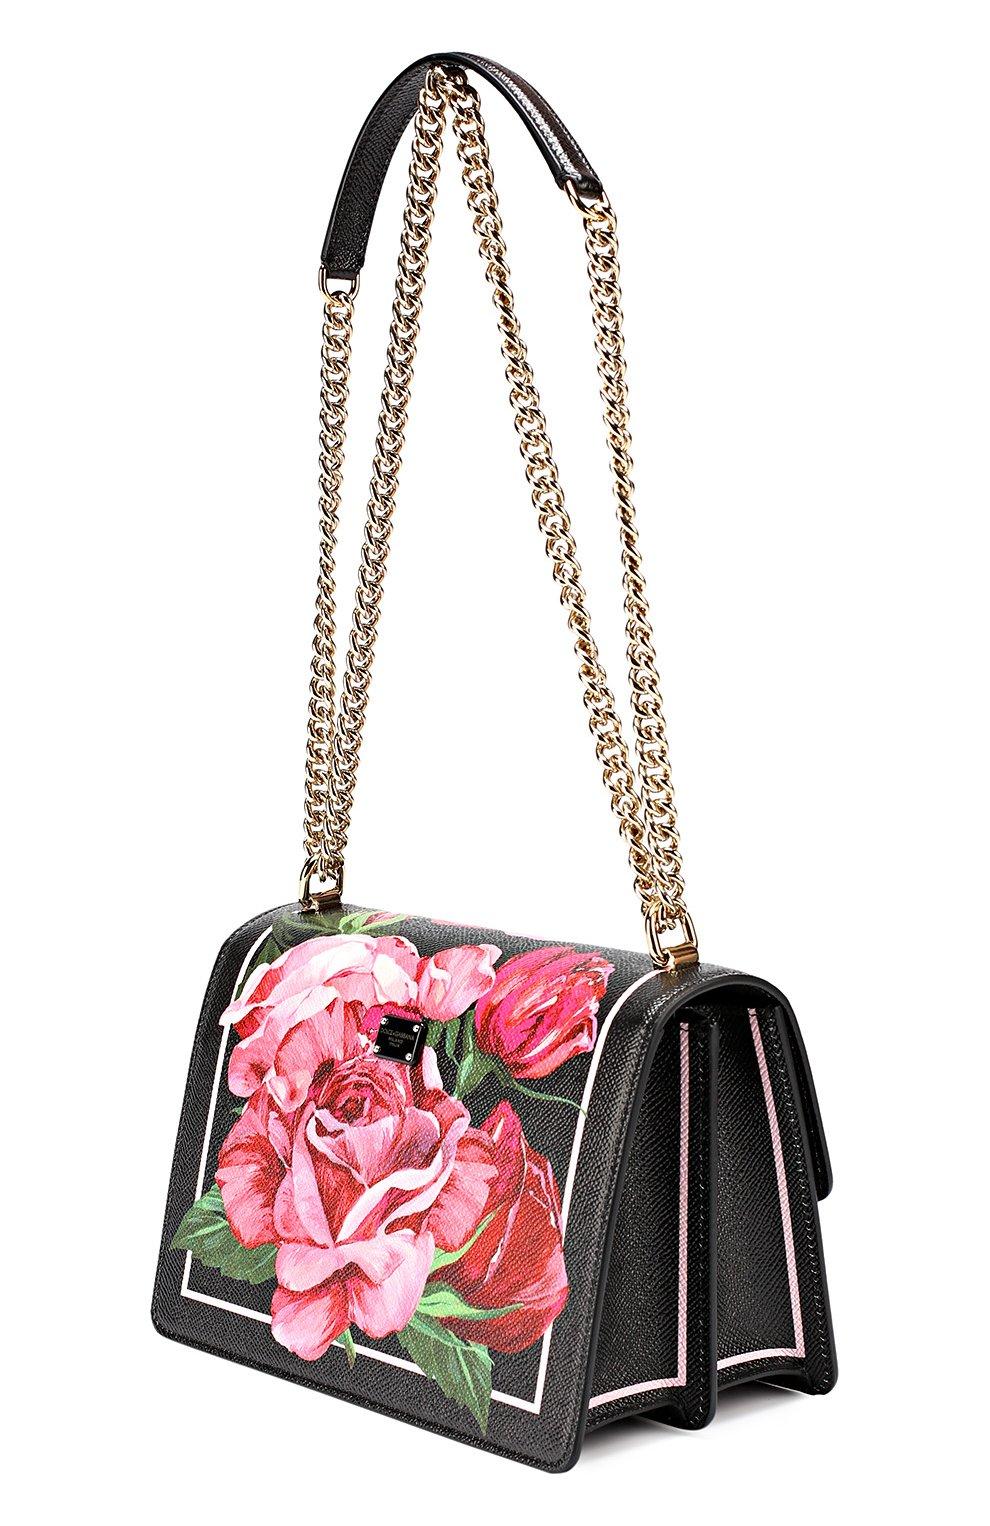 Сумка Rosalia small с принтом Dolce & Gabbana розовая цвета | Фото №3